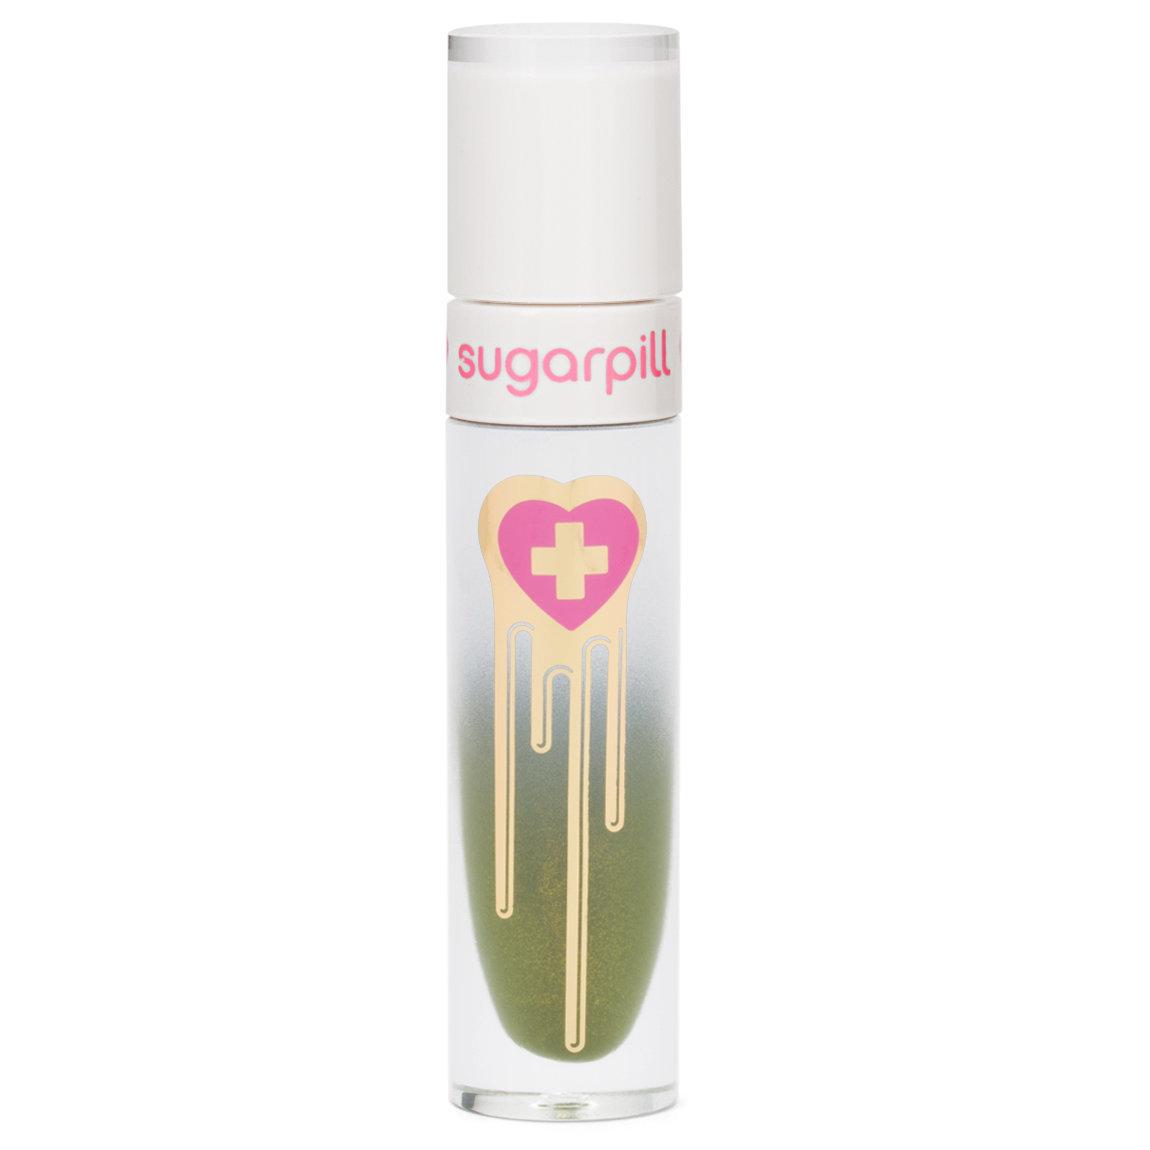 Sugarpill Cosmetics Liquid Lip Color Dropout